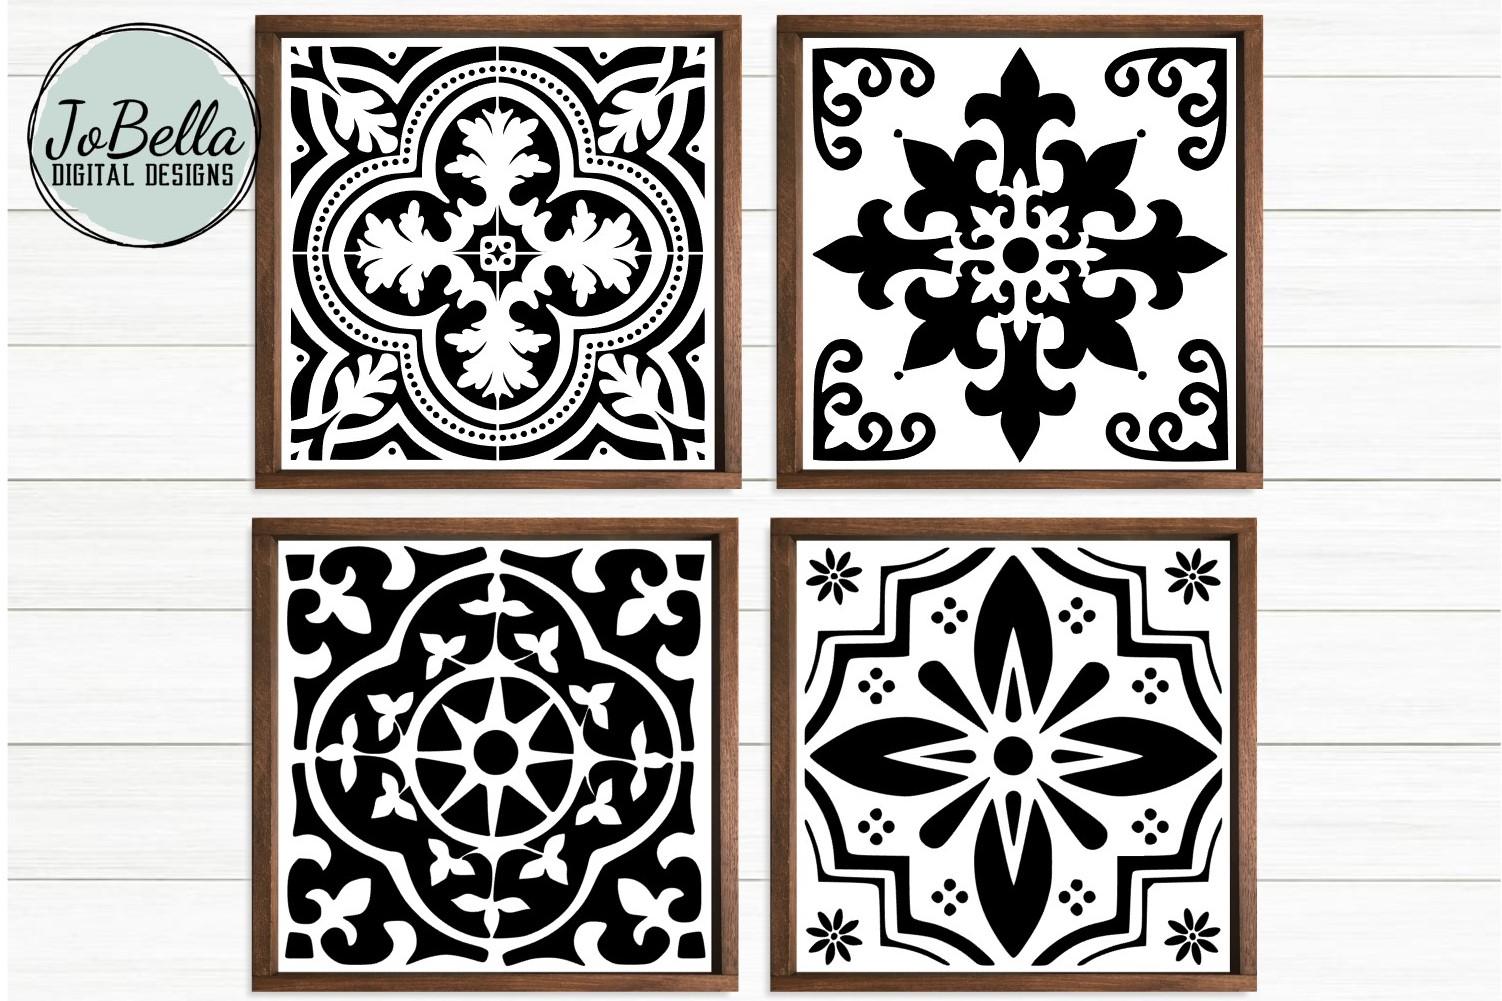 image about Printable Designs named Spanish Tile SVG Offer, Sublimation Printable Programs